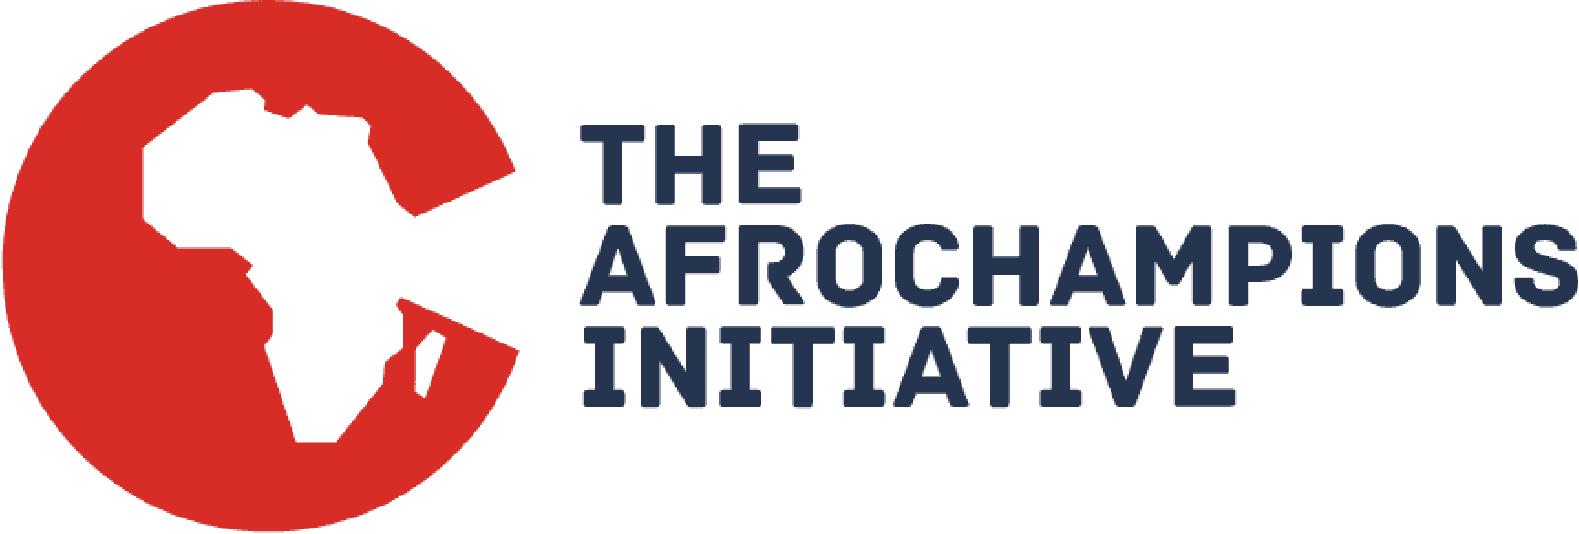 afrochampions